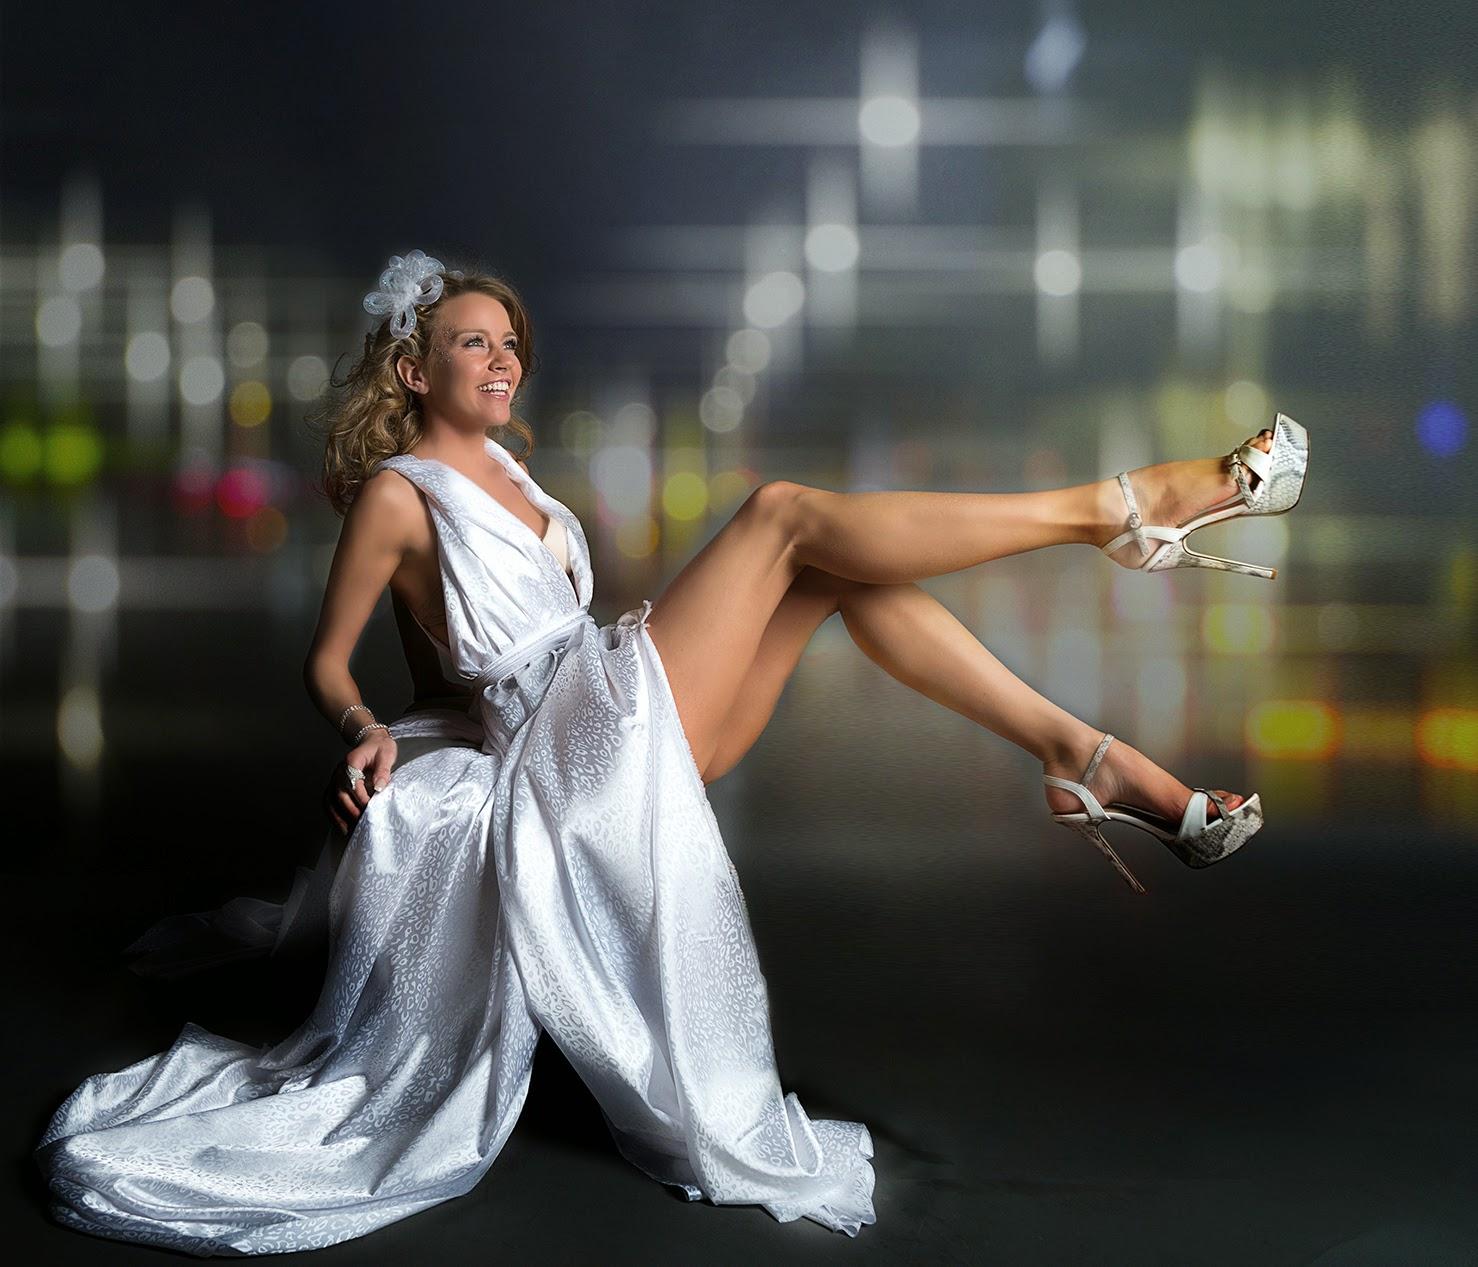 Peter & Partner: Wendy Night: Kann denn Striptease Sünde sein?